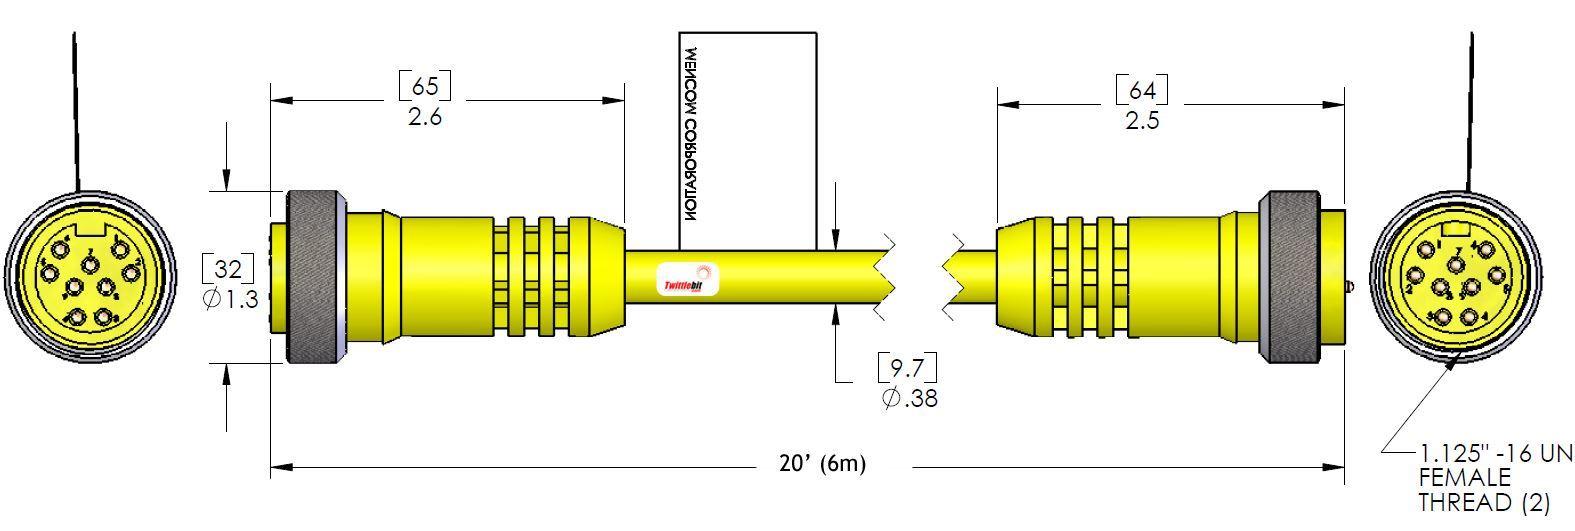 MIN9MFPX20, MINI (Size 3) 9 Pole PVC Straight Cables